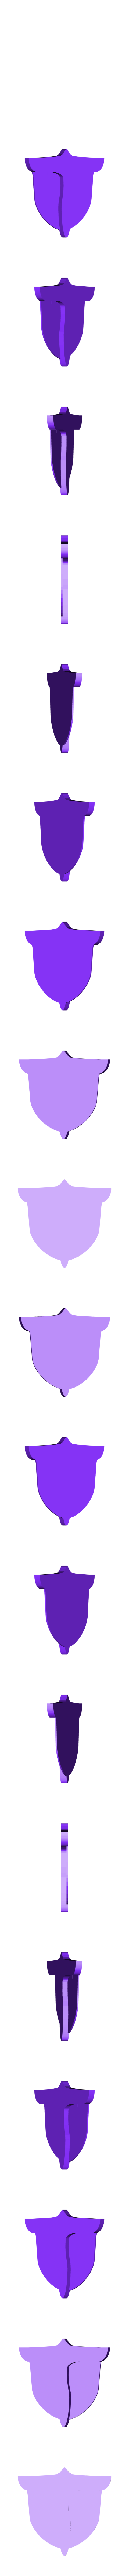 DarliFra_badge_base.stl Download free STL file Darling in the Franxx Badge • 3D printing design, sh0rt_stak